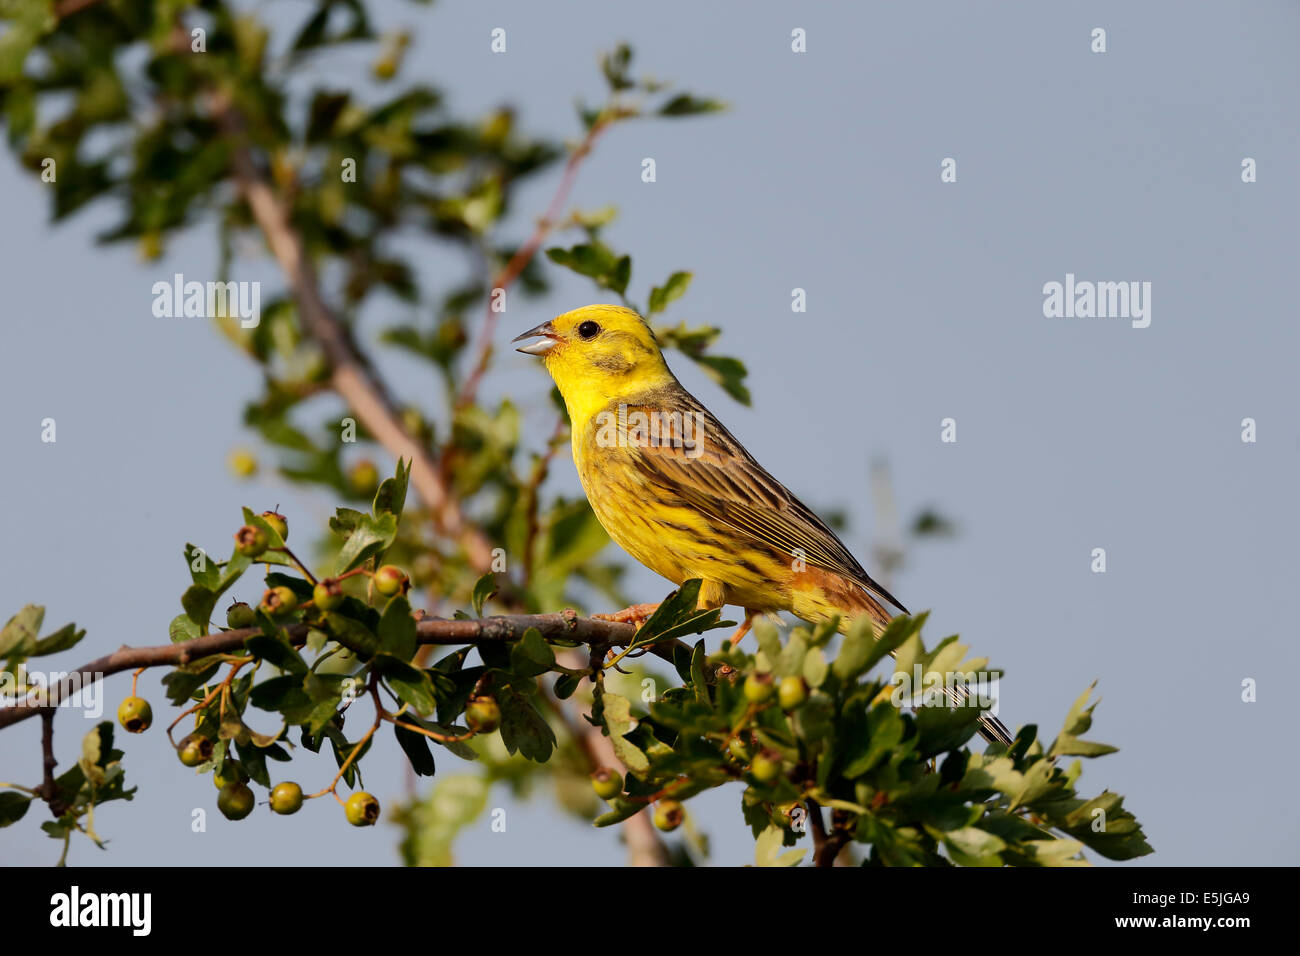 Yellowhammer, Emberiza citrinella, single male on branch singing, Warwickshire, July 2014 - Stock Image